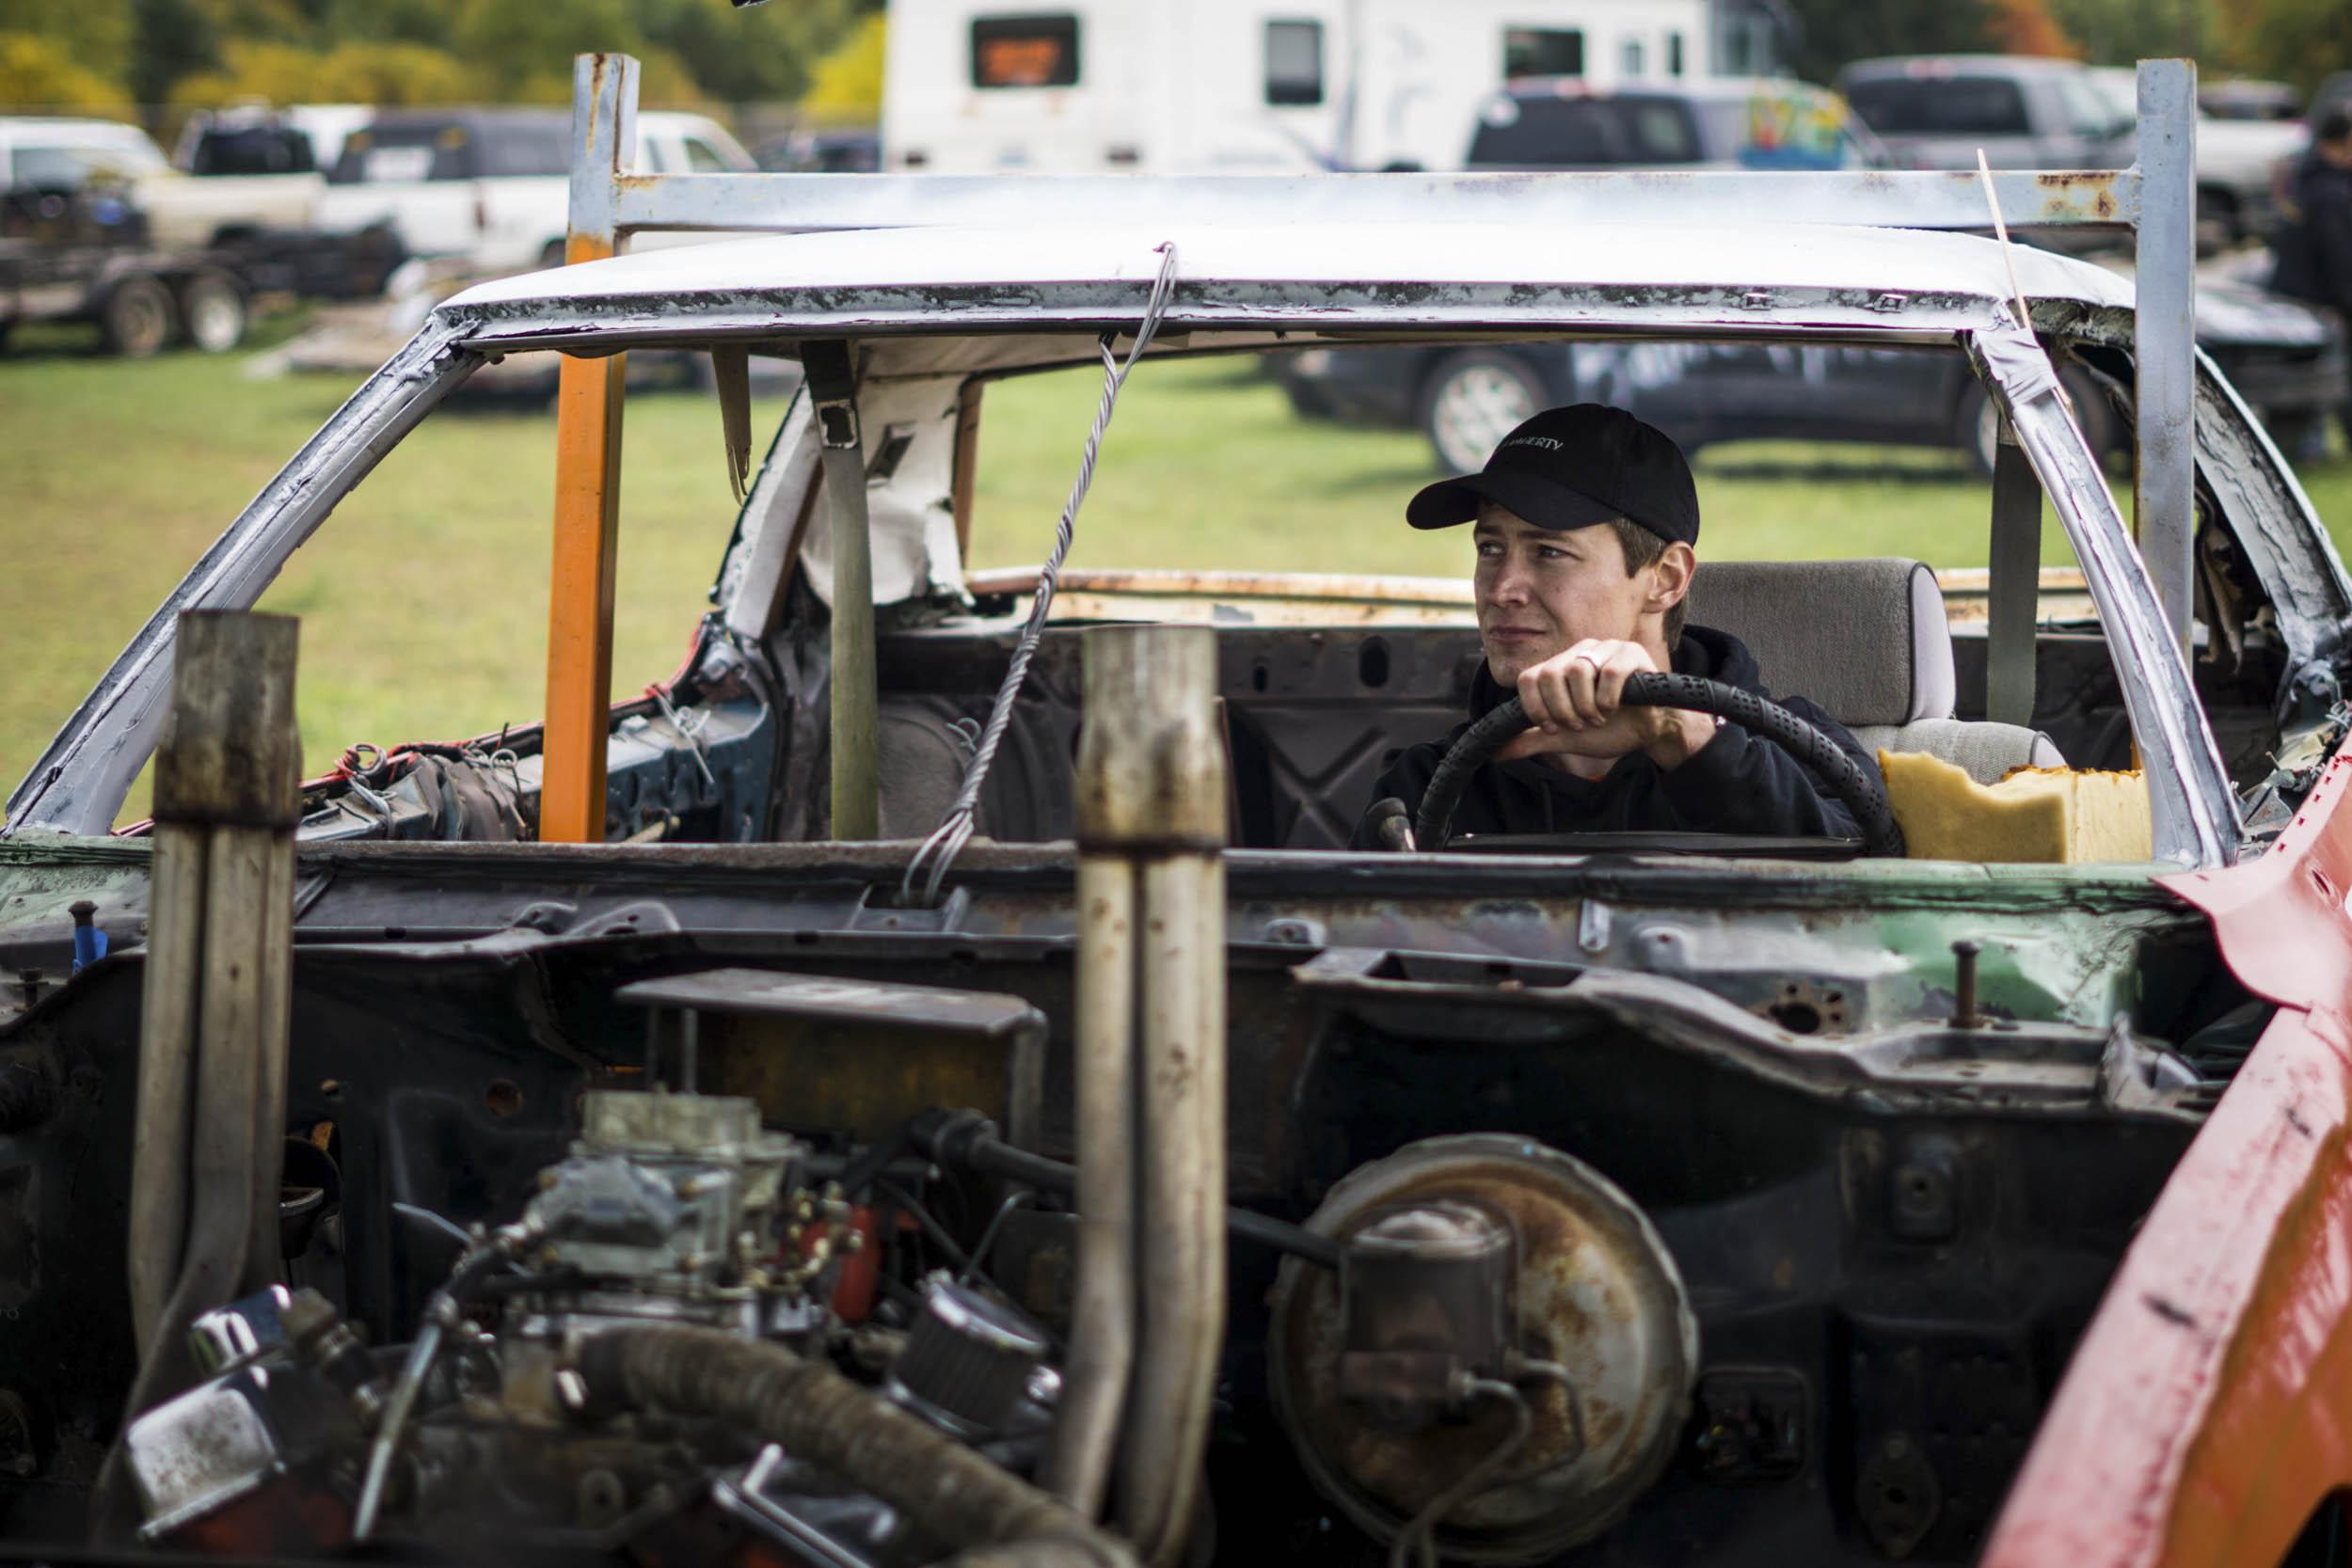 Tim Wahl in his demo derby car